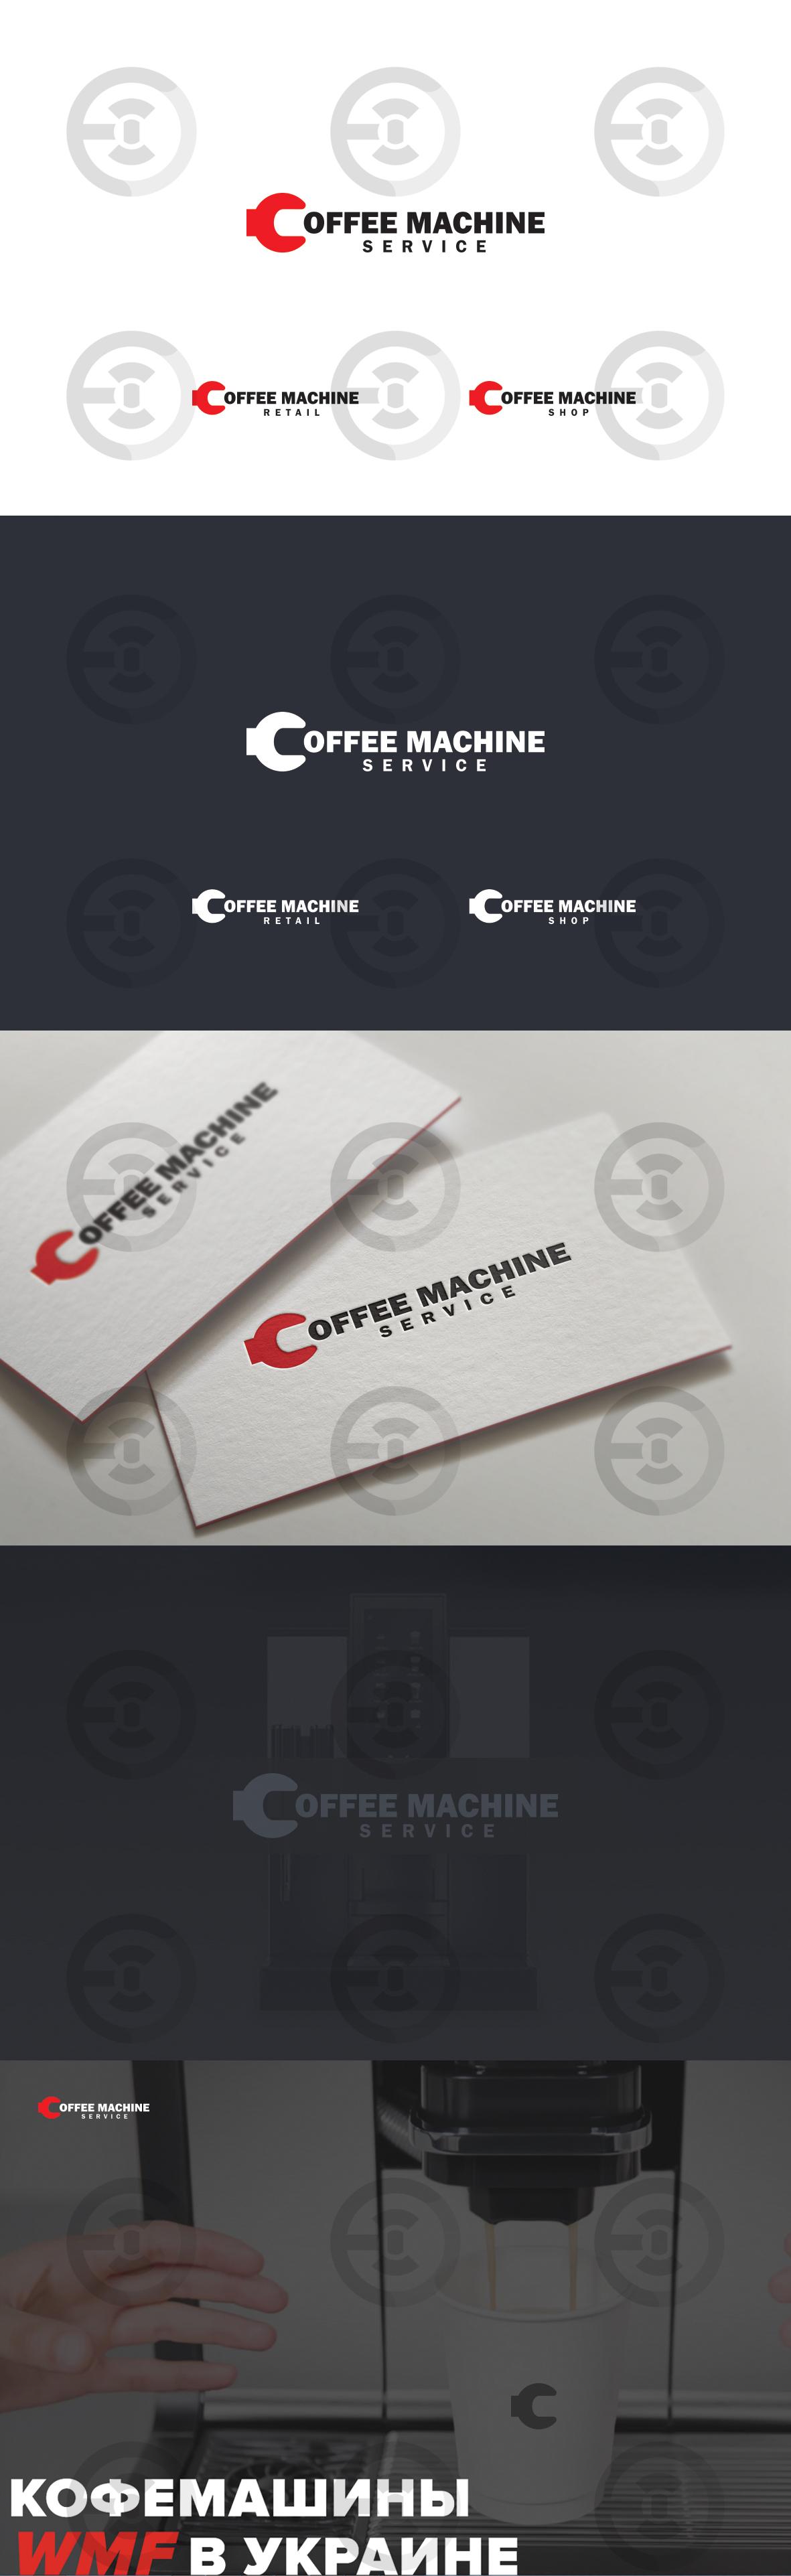 cms logo mock.jpg